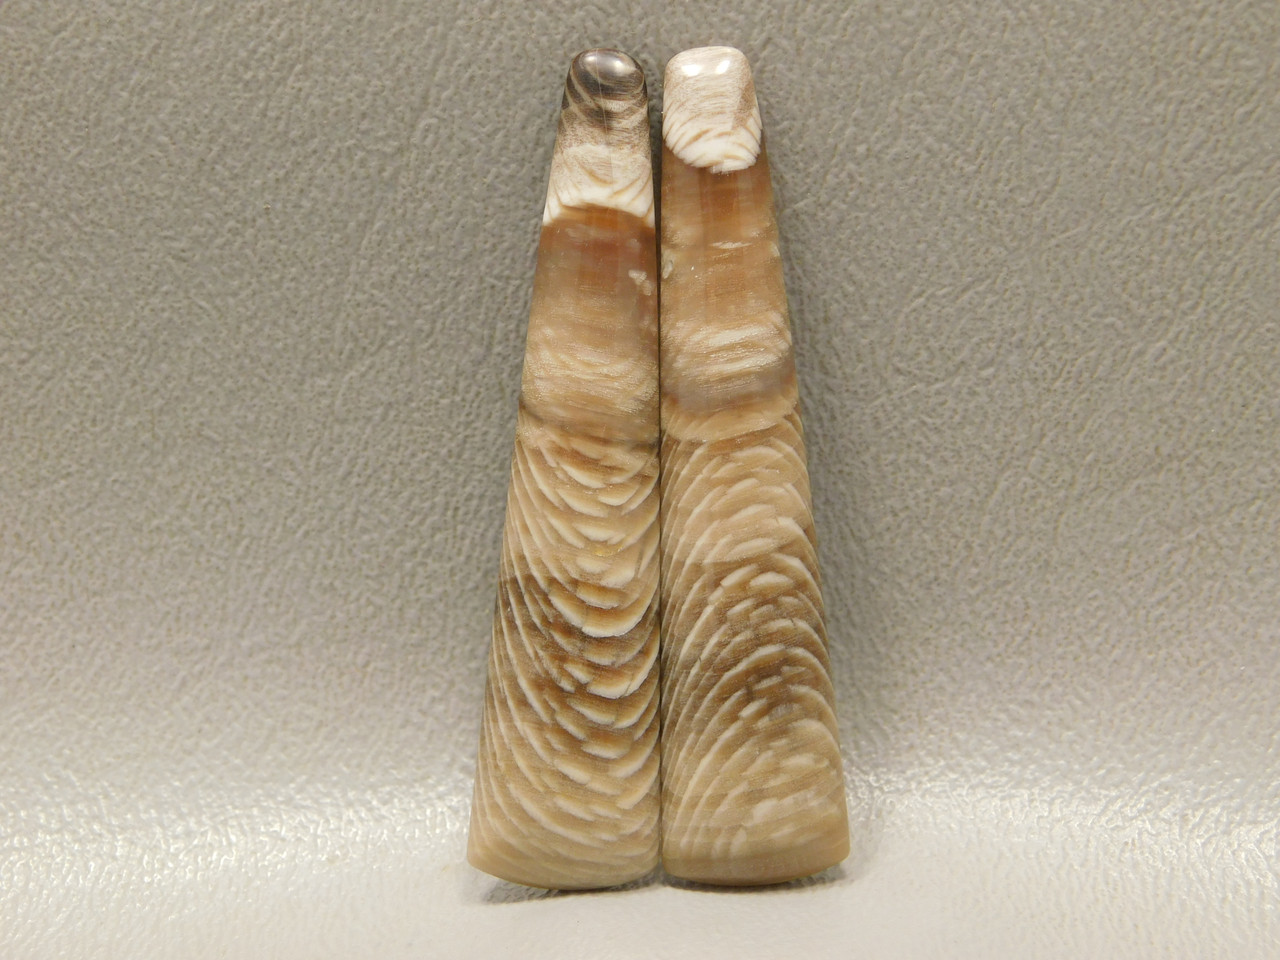 Petrified Wood Sycamore Matched Pair Long Thin Cabochon Stones #16